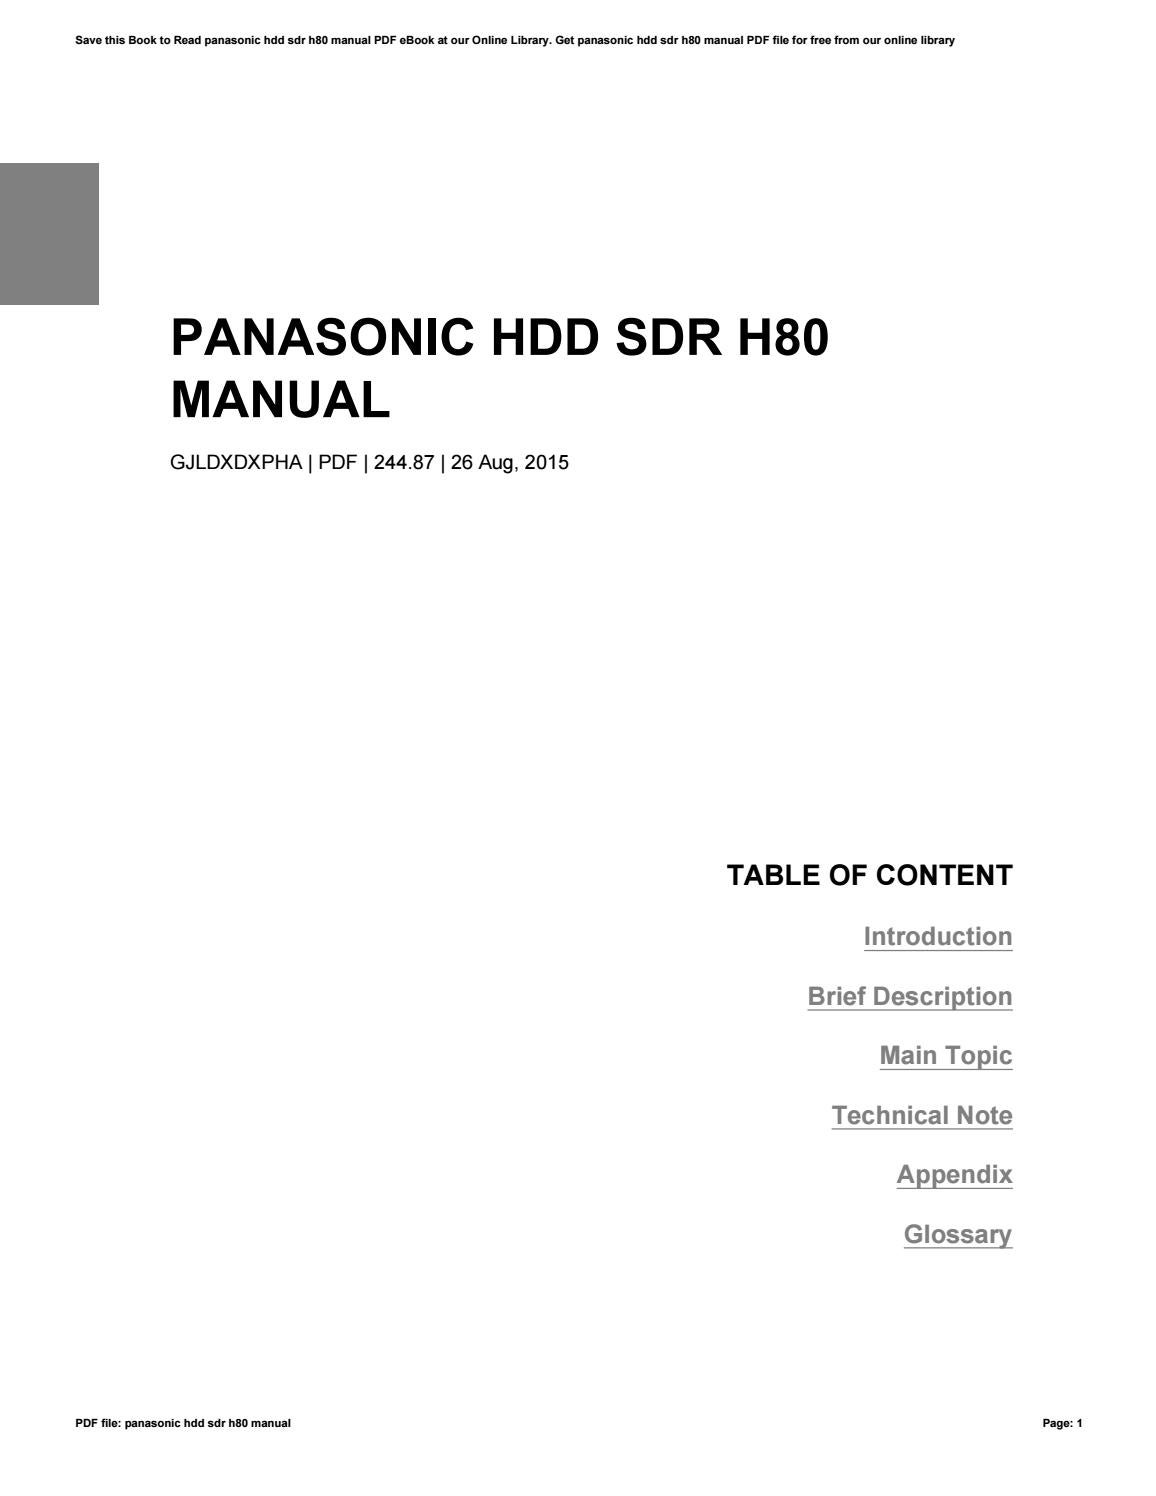 Panasonic sdr-h80 digital camcorder download instruction manual pdf.